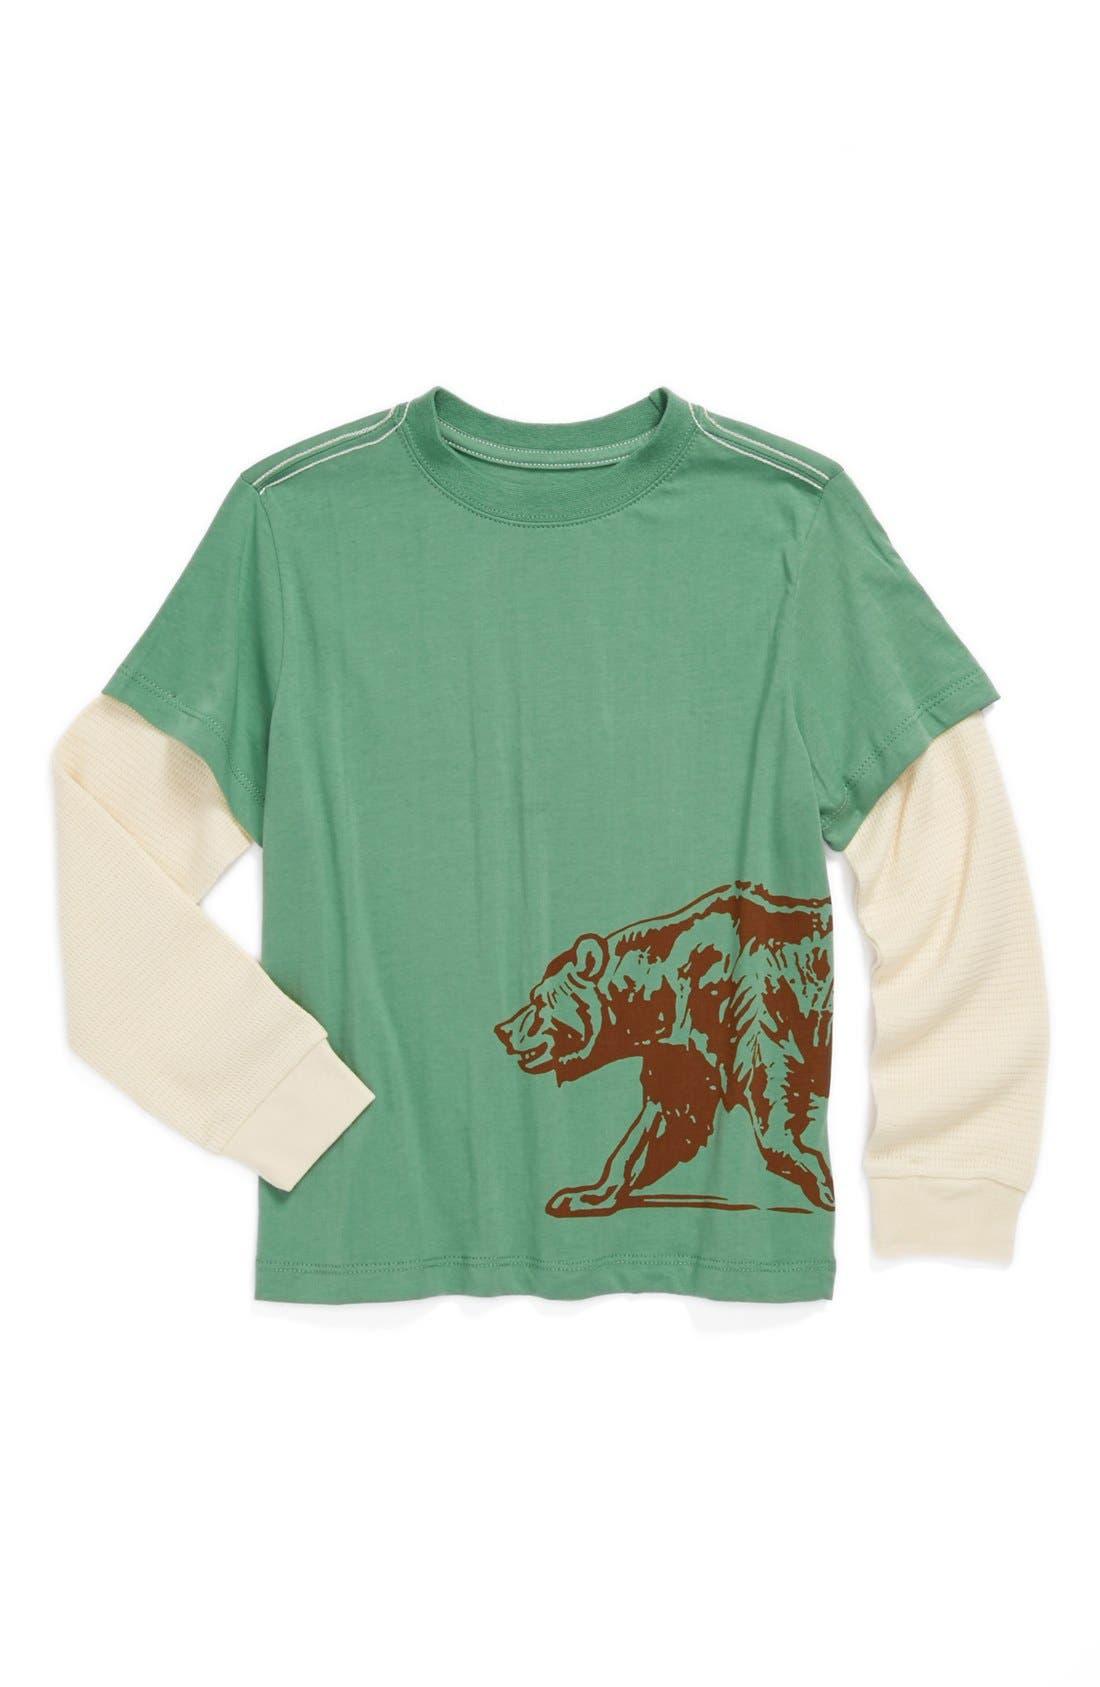 Main Image - Peek 'Bear' T-Shirt (Toddler Boys, Little Boys & Big Boys)